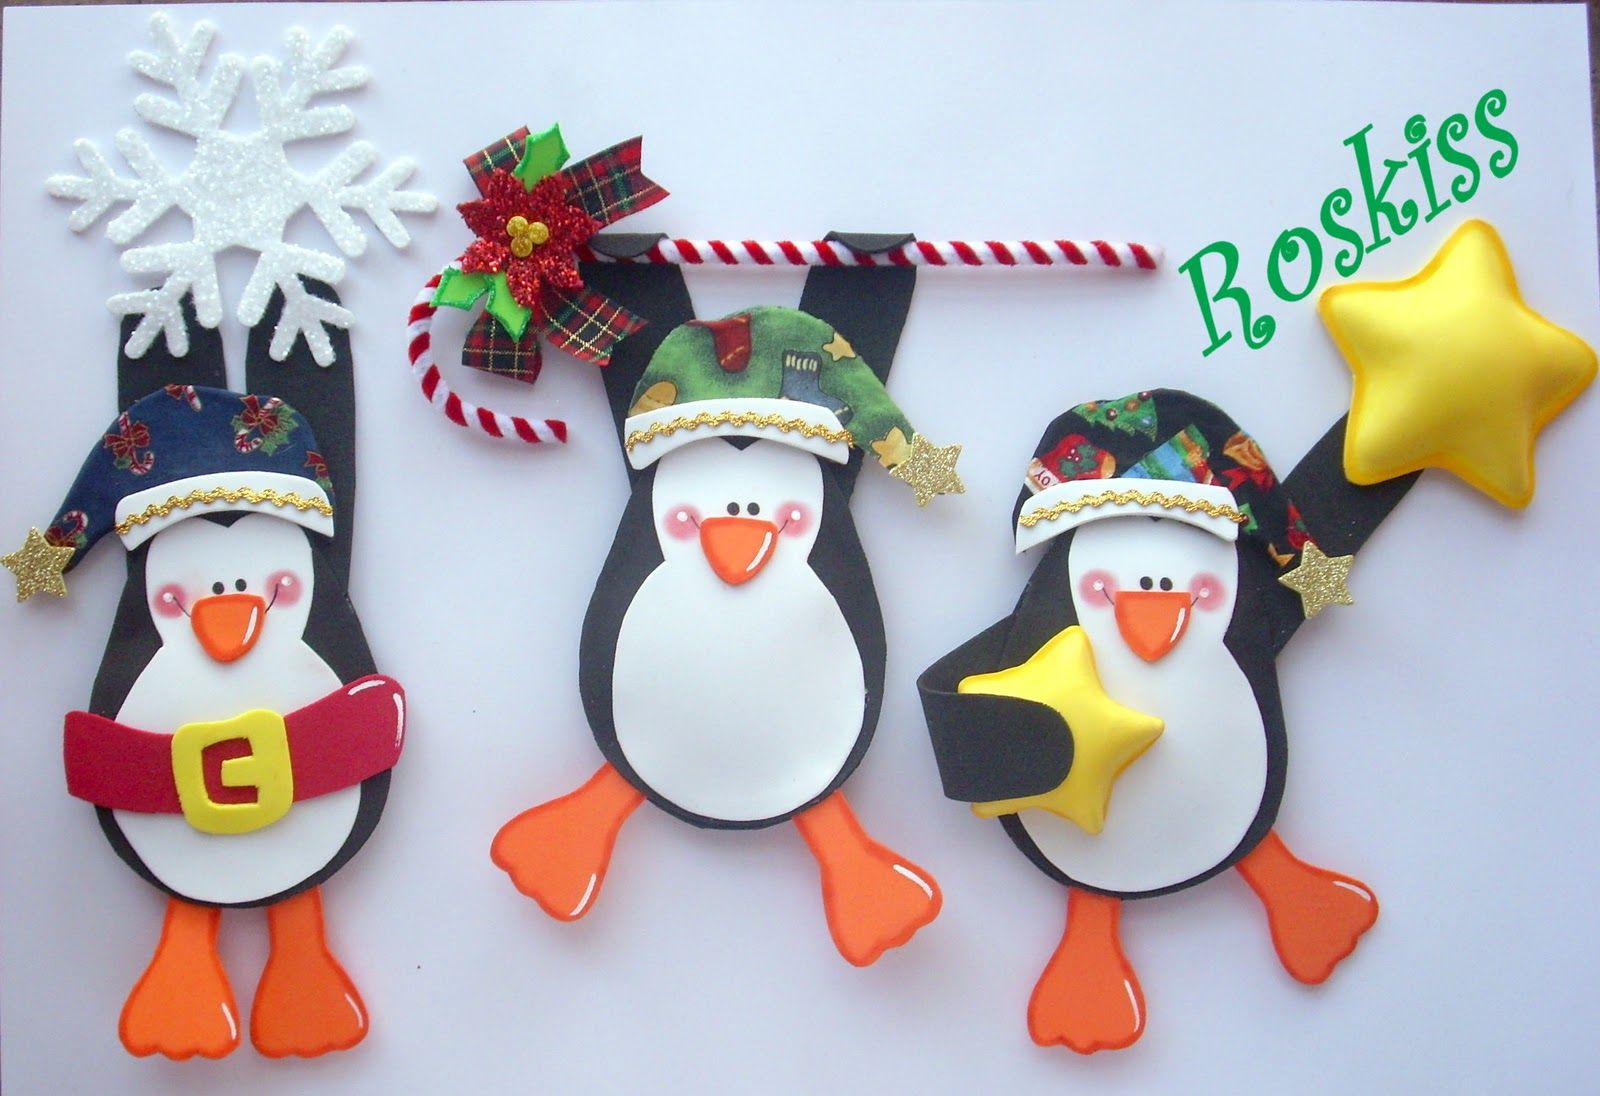 Pinguinos en foamy manualidades navidad navidad goma for Manualidades souvenirs navidenos